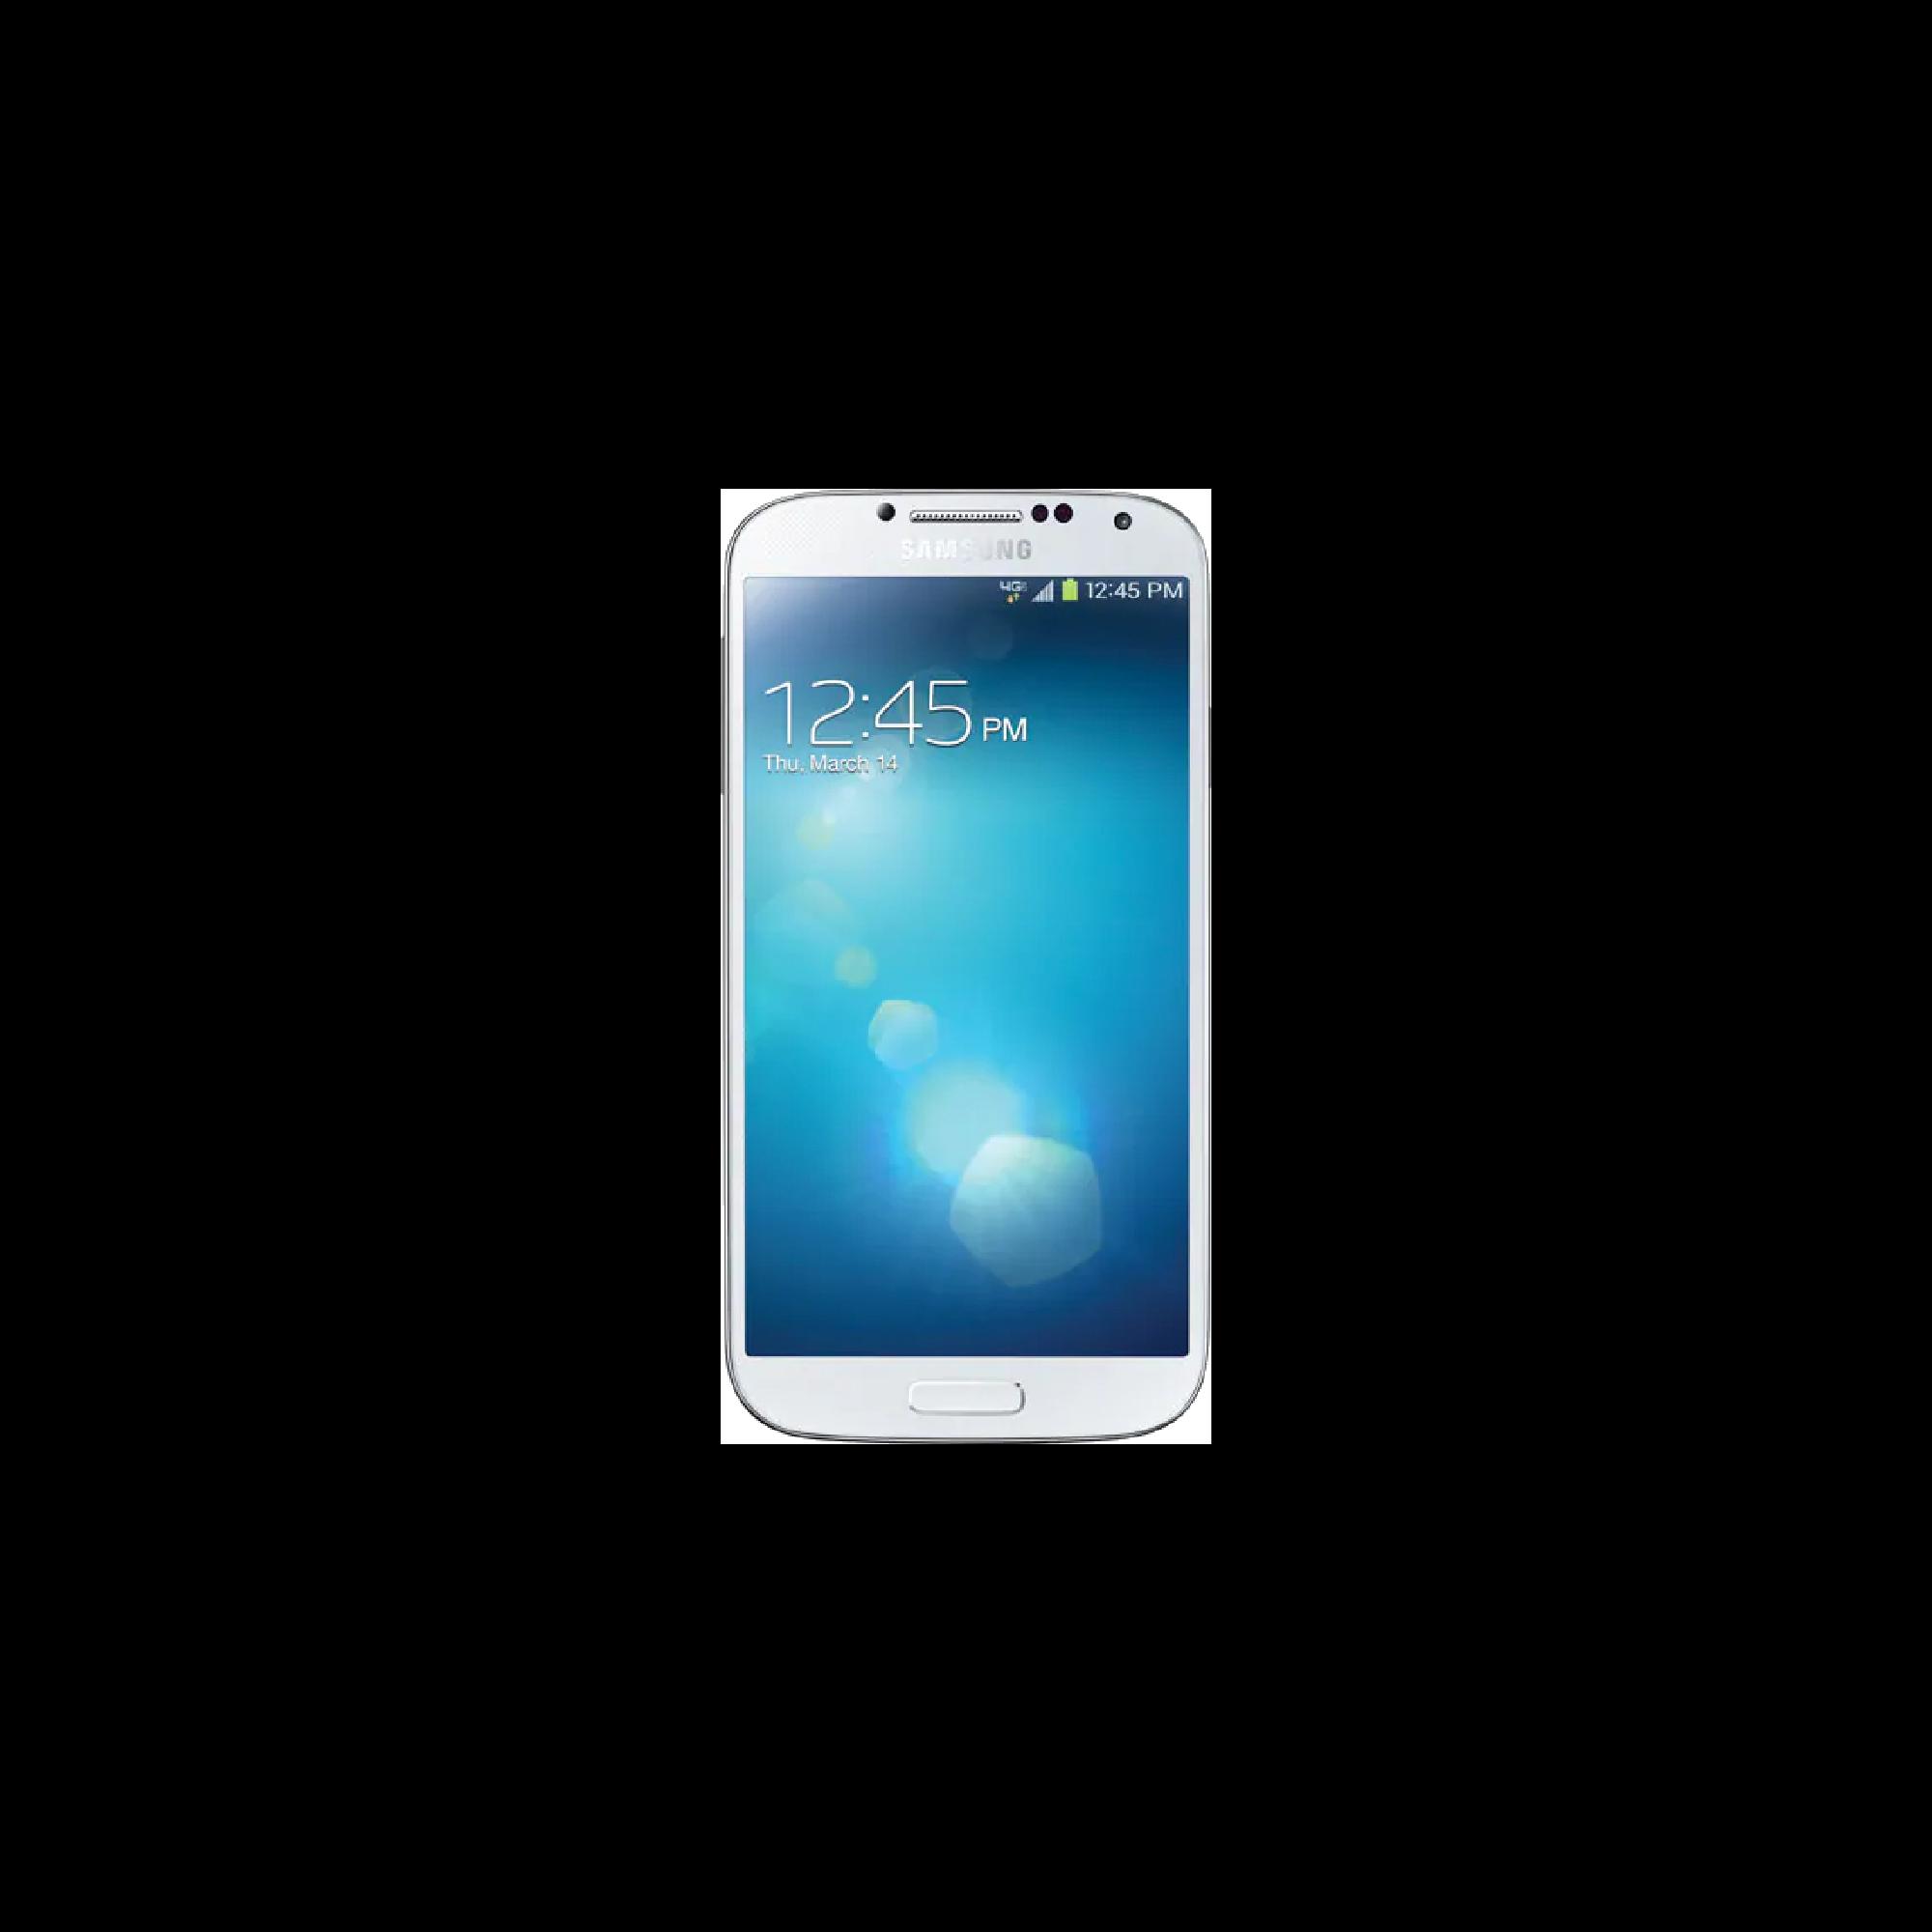 Samsung S4 | $89 + tax